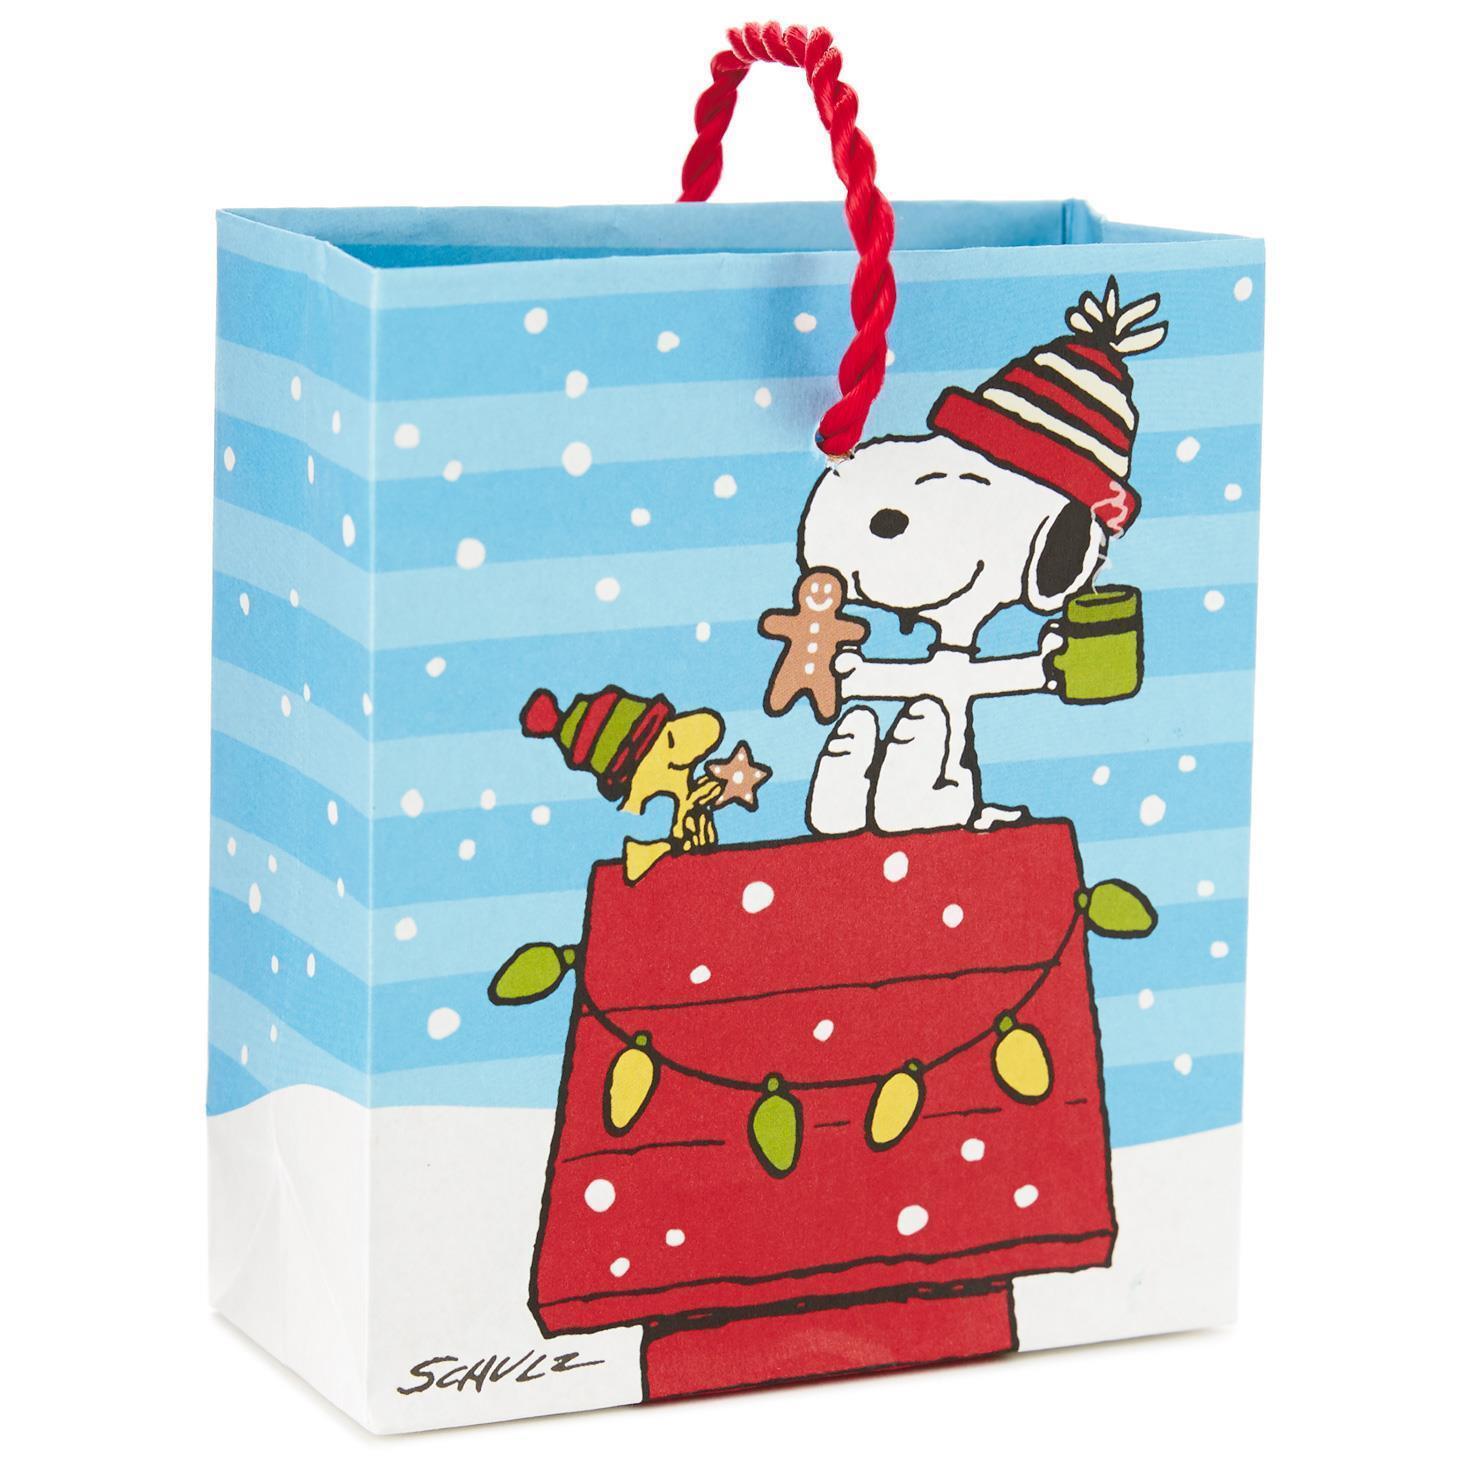 Lot 3 Hallmark Peanuts Snoopy Woodstock Christmas Gift Bag 4